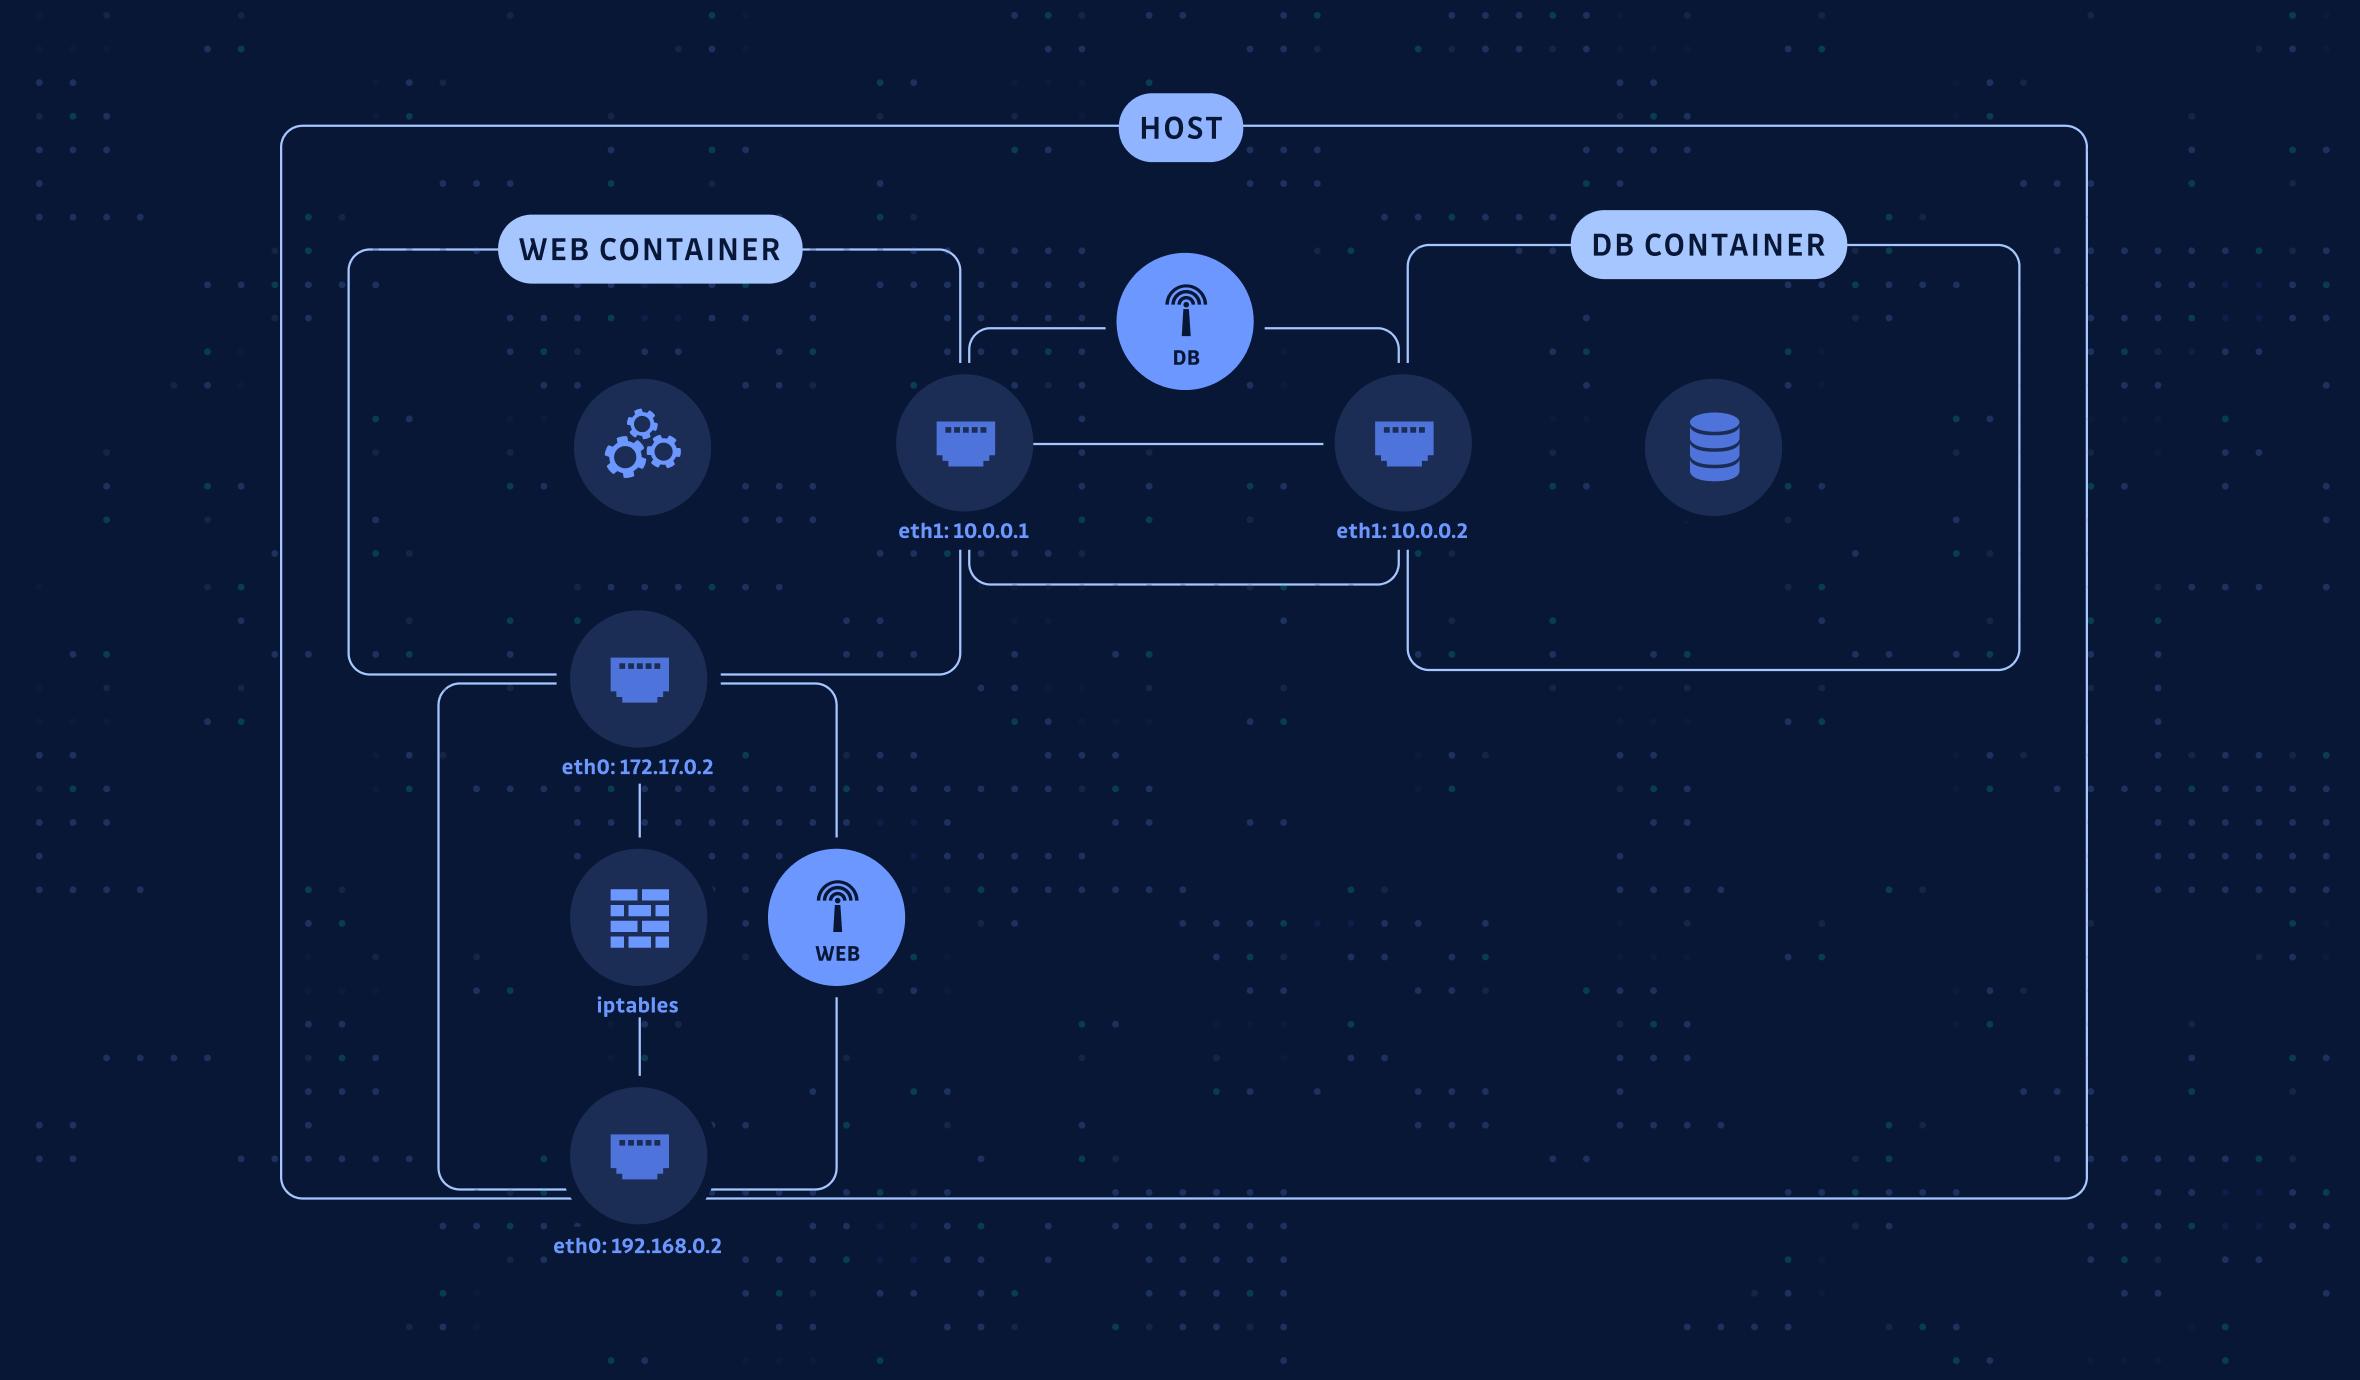 Docker networking simple example